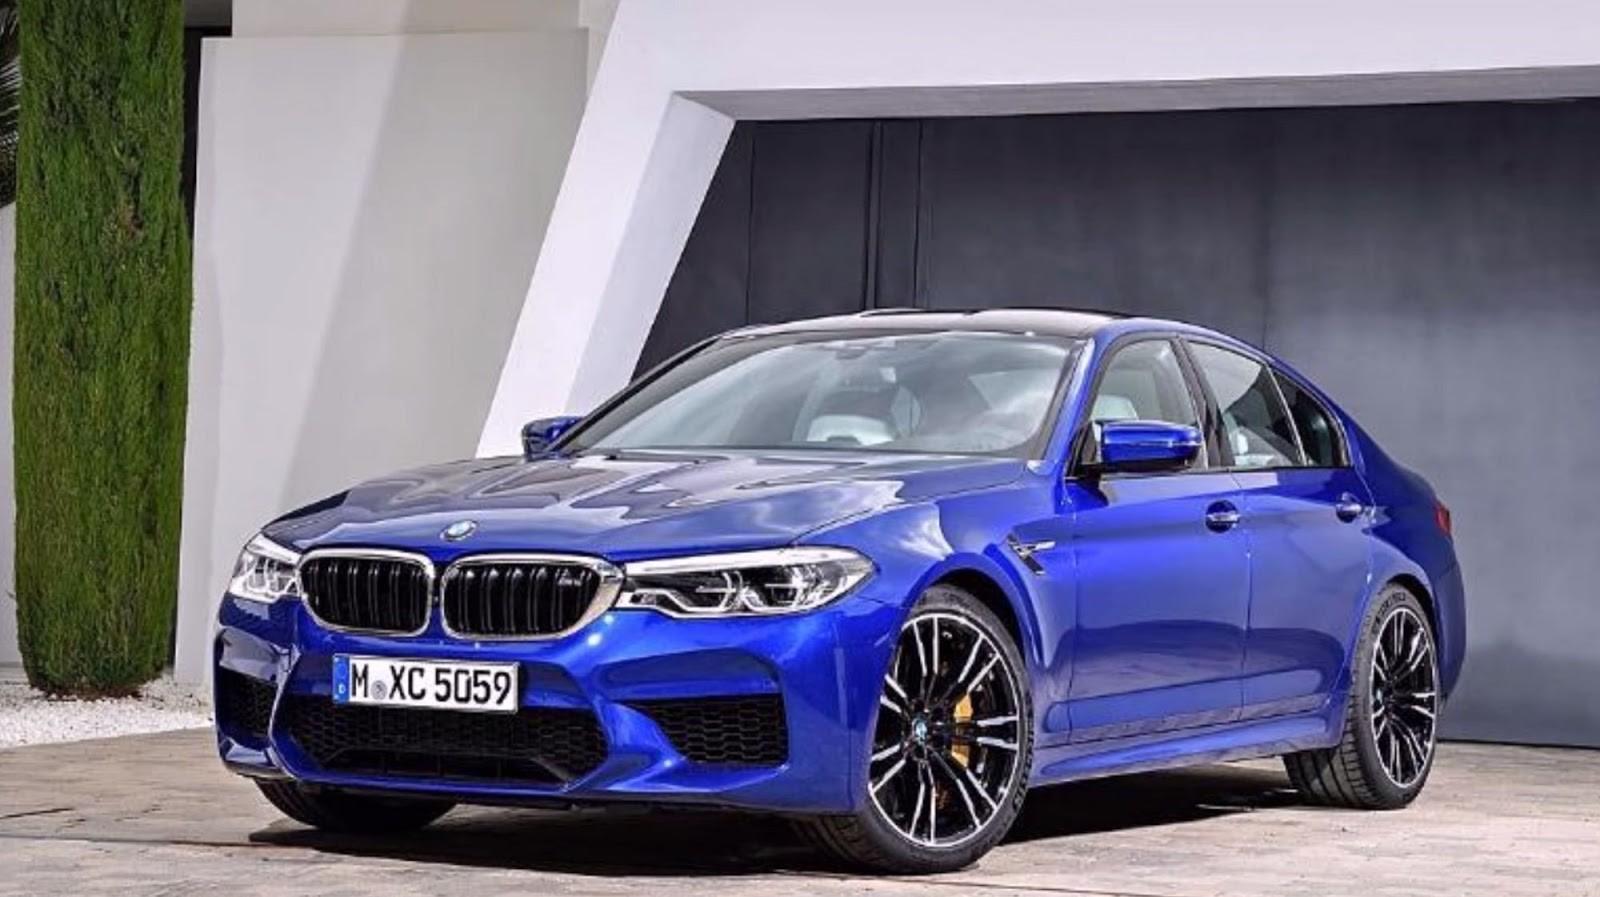 Foto de BMW M5 2018 (filtrado) (1/7)